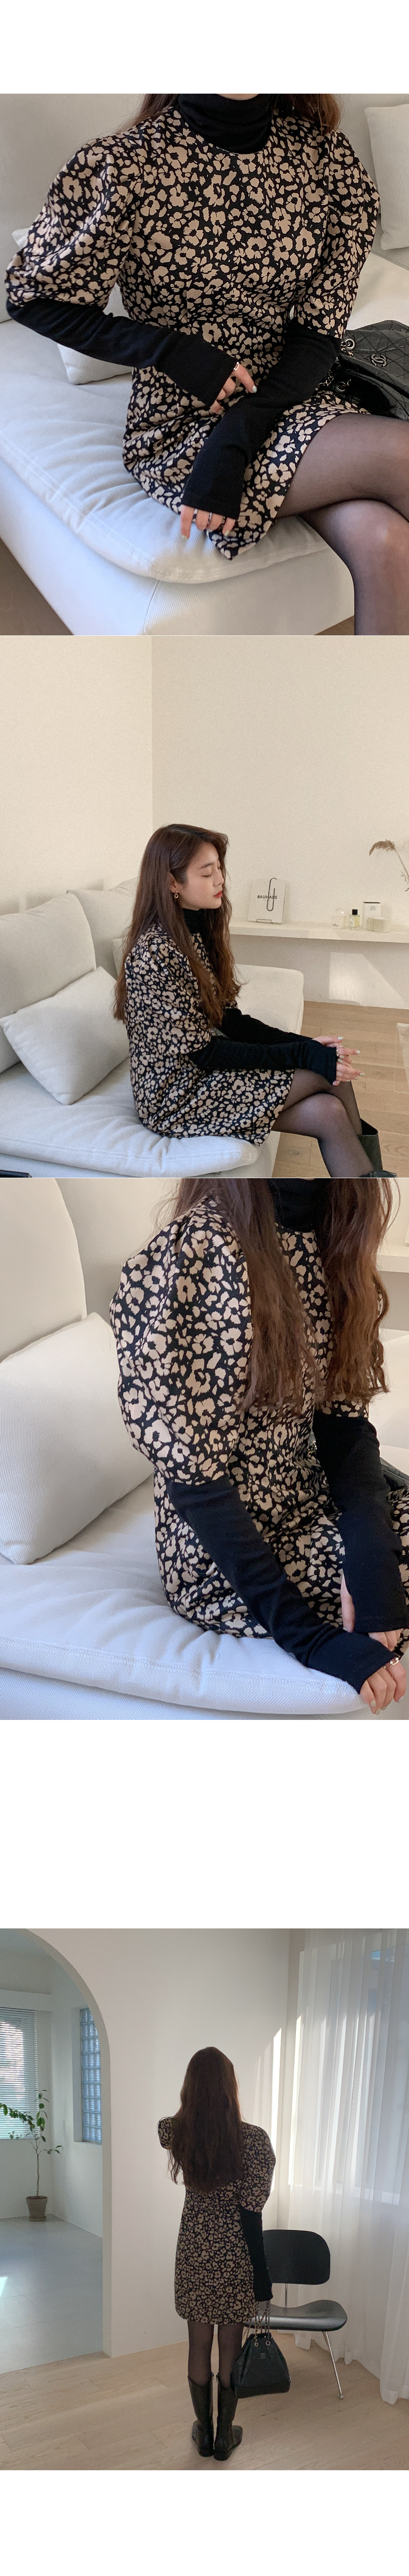 Veroji leopard dress